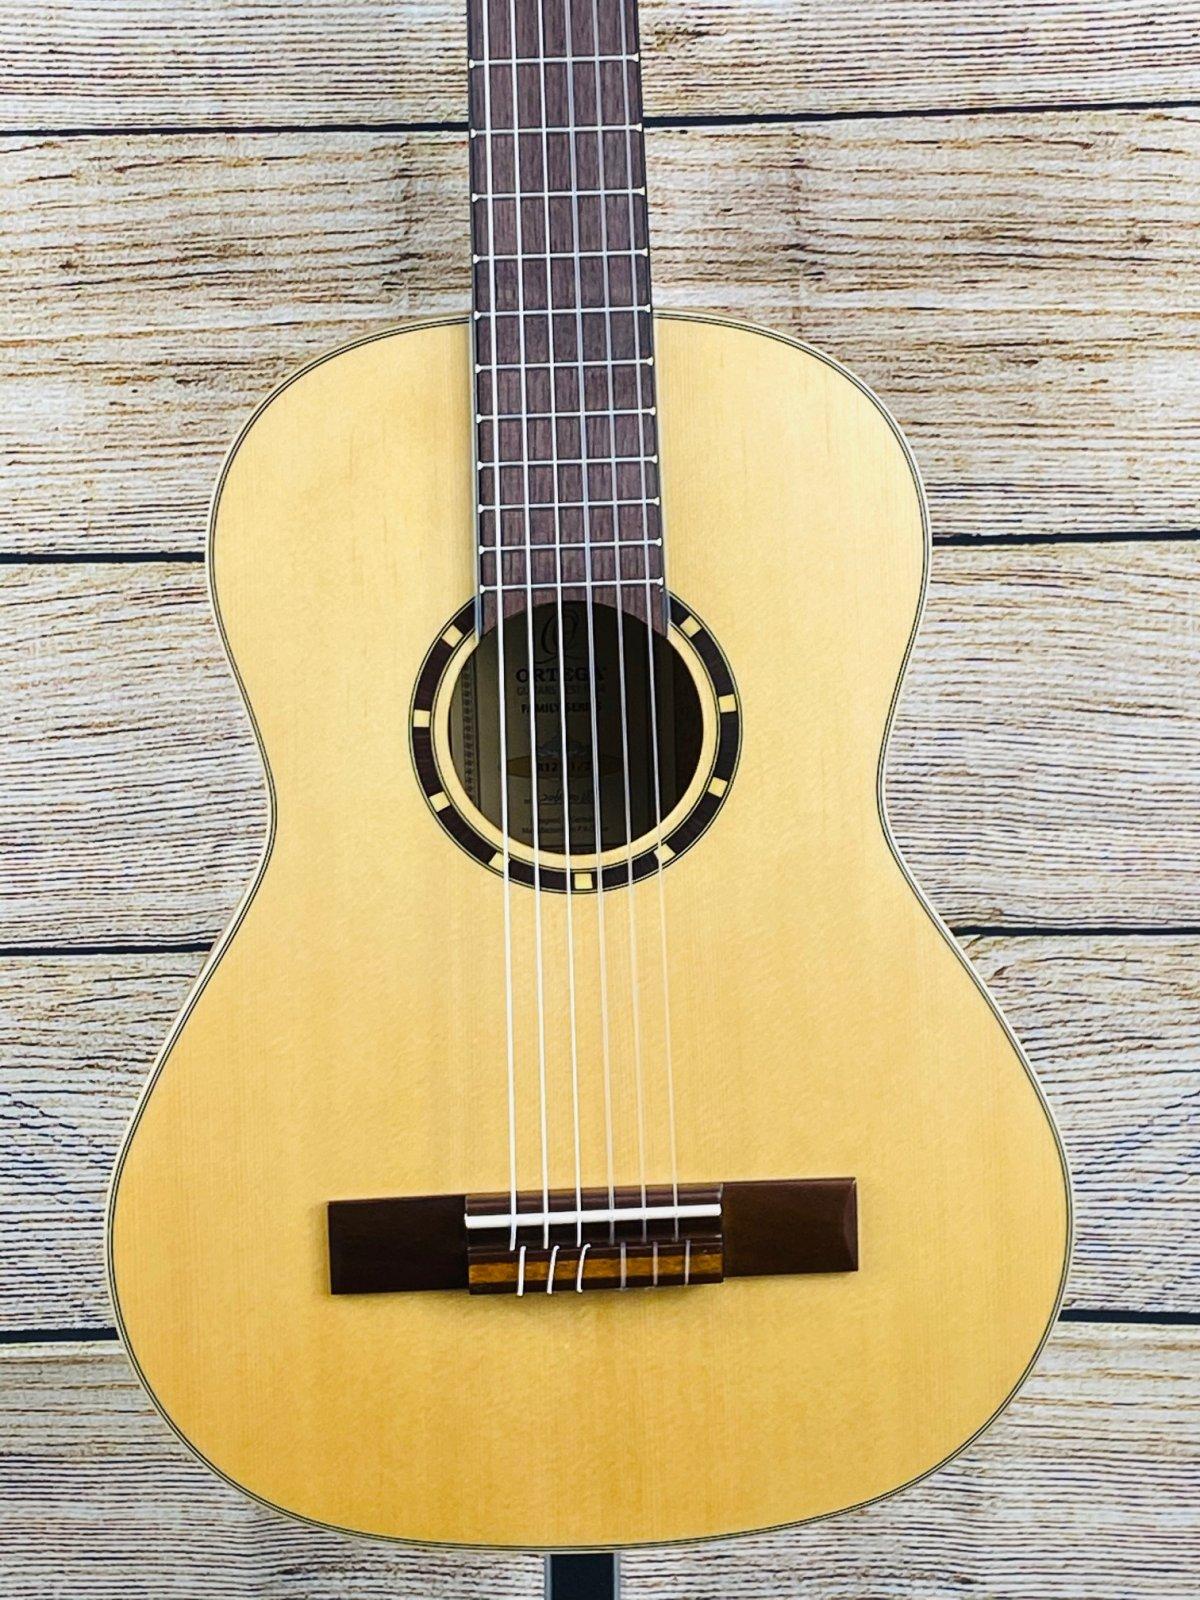 Ortega Guitars R121 Family Series Spruce Top Nylon String 1/2 Size Acoustic Guitar, Walnut Fretboard, Natural